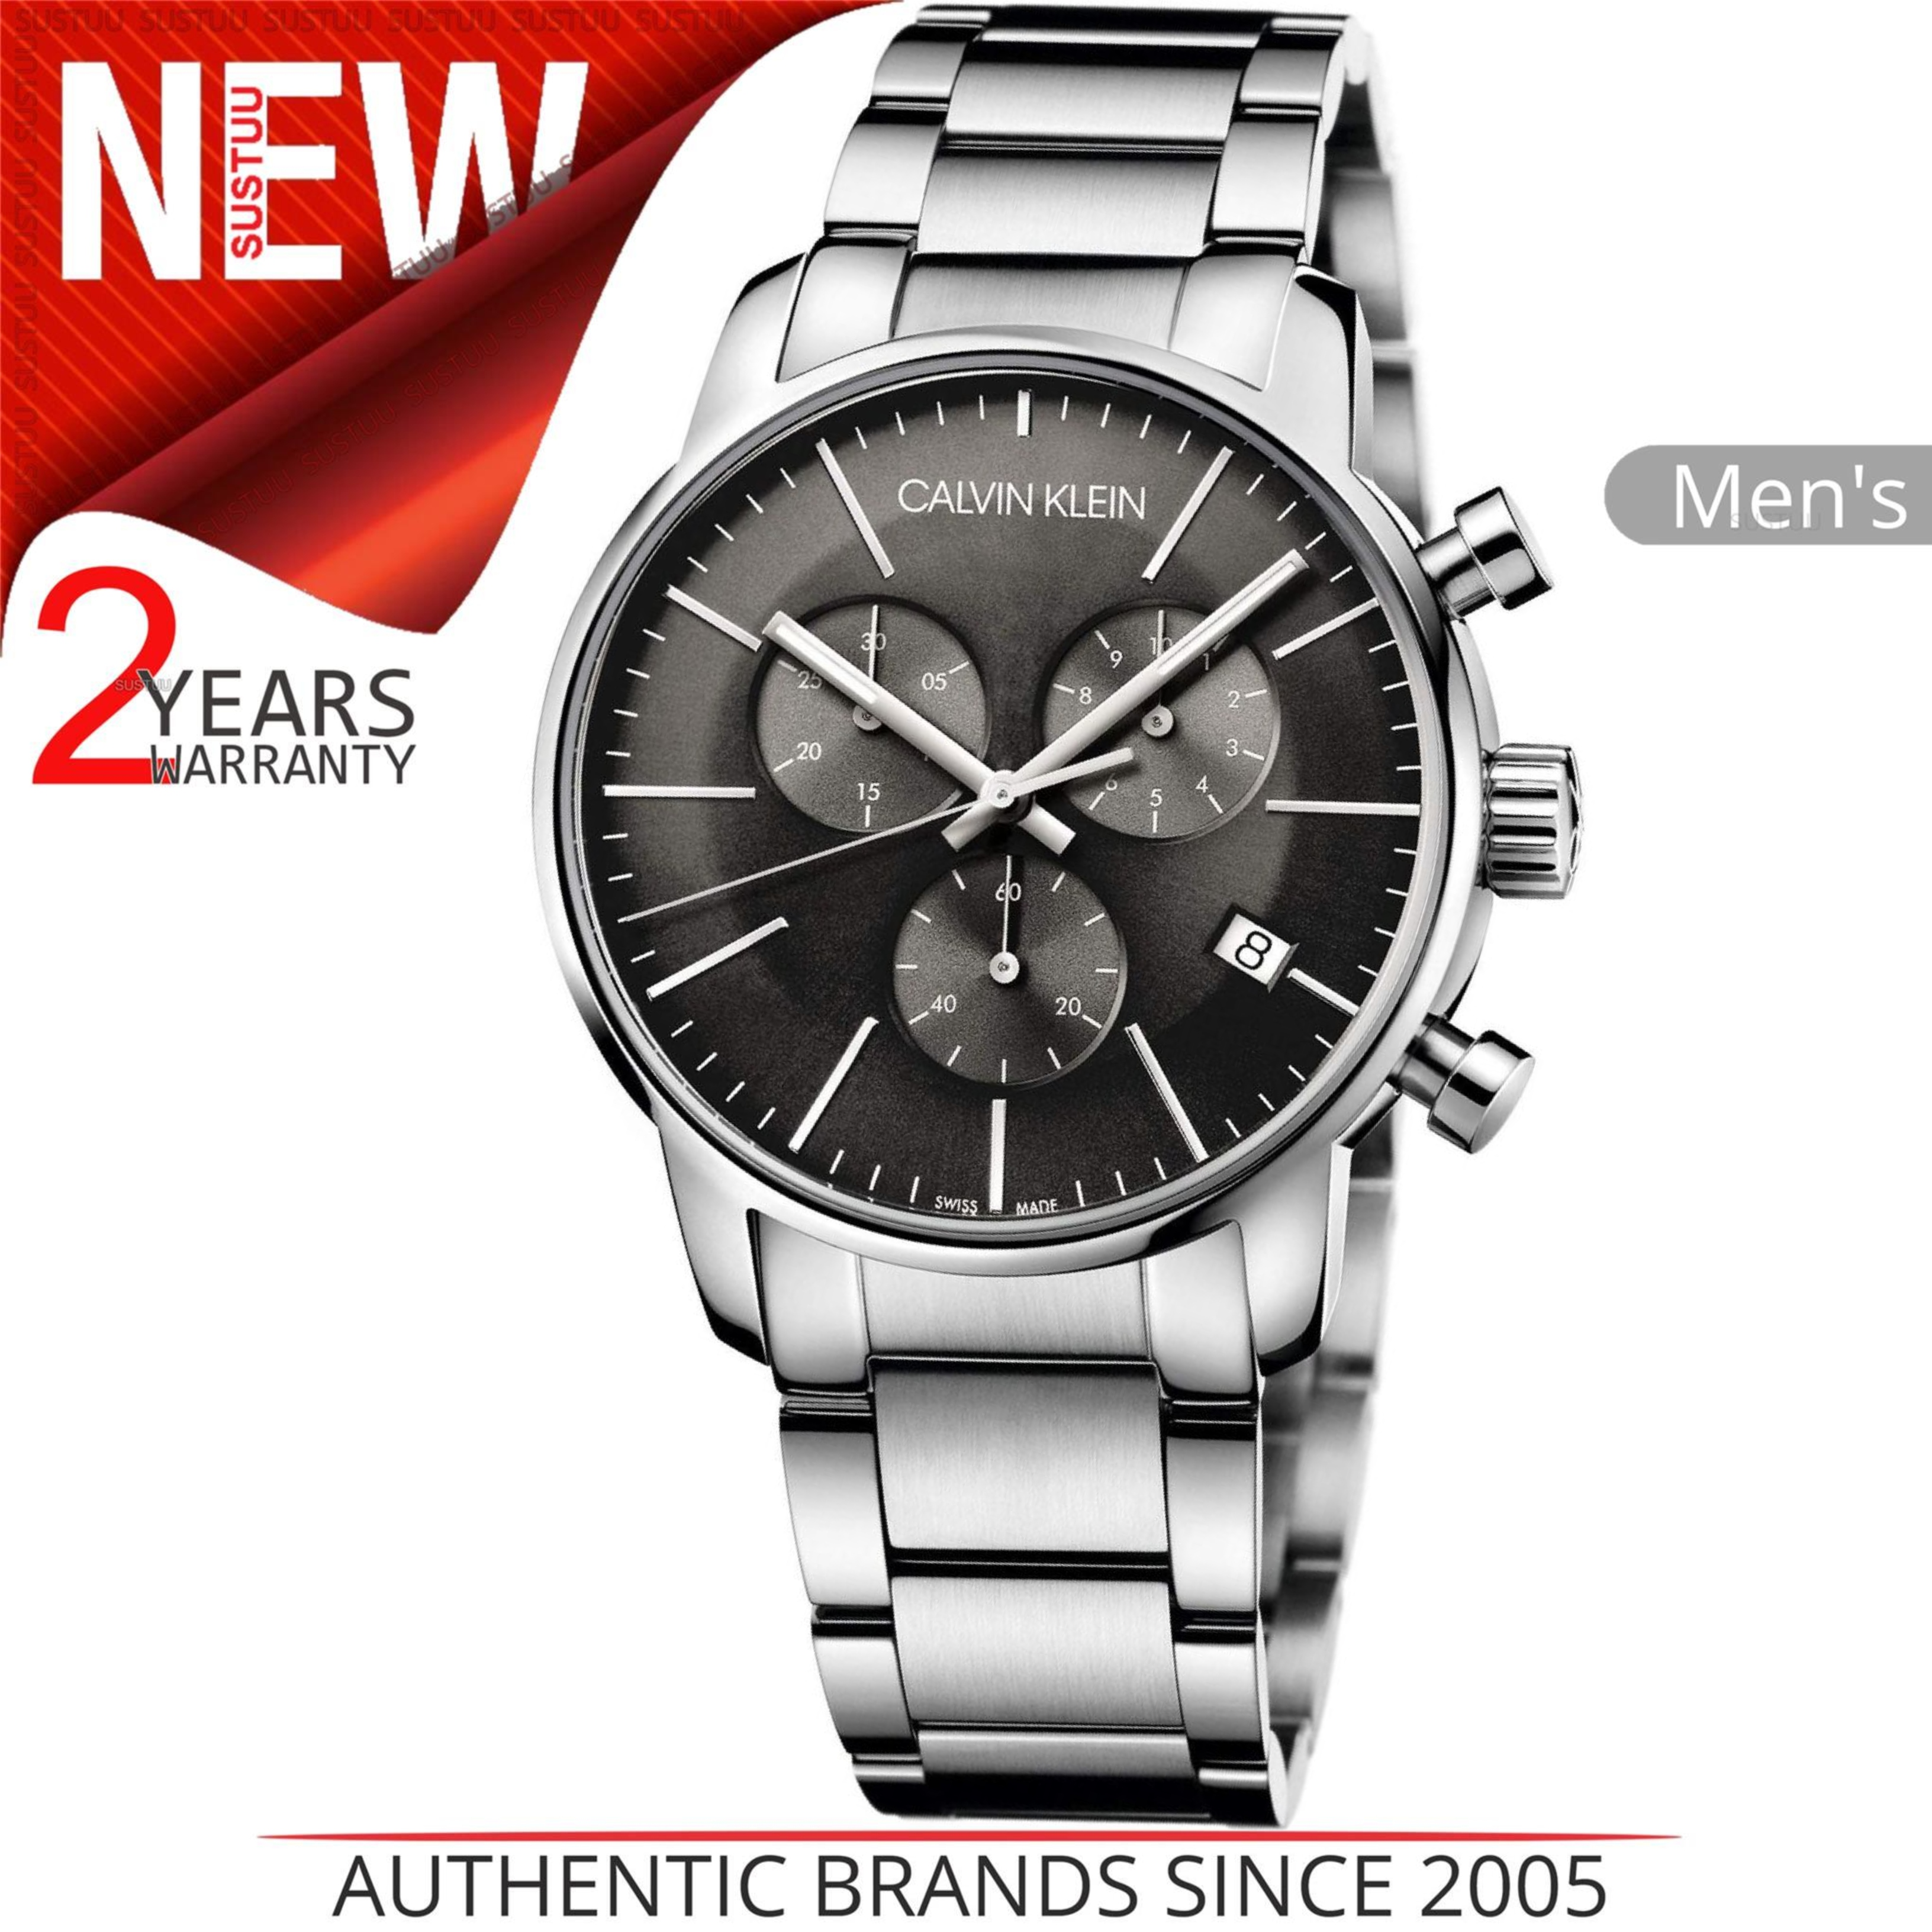 fdf064e50 Sentinel Calvin Klein City Men's Watch K2G27143│Chronograph Black Dial│ Stainless Strap